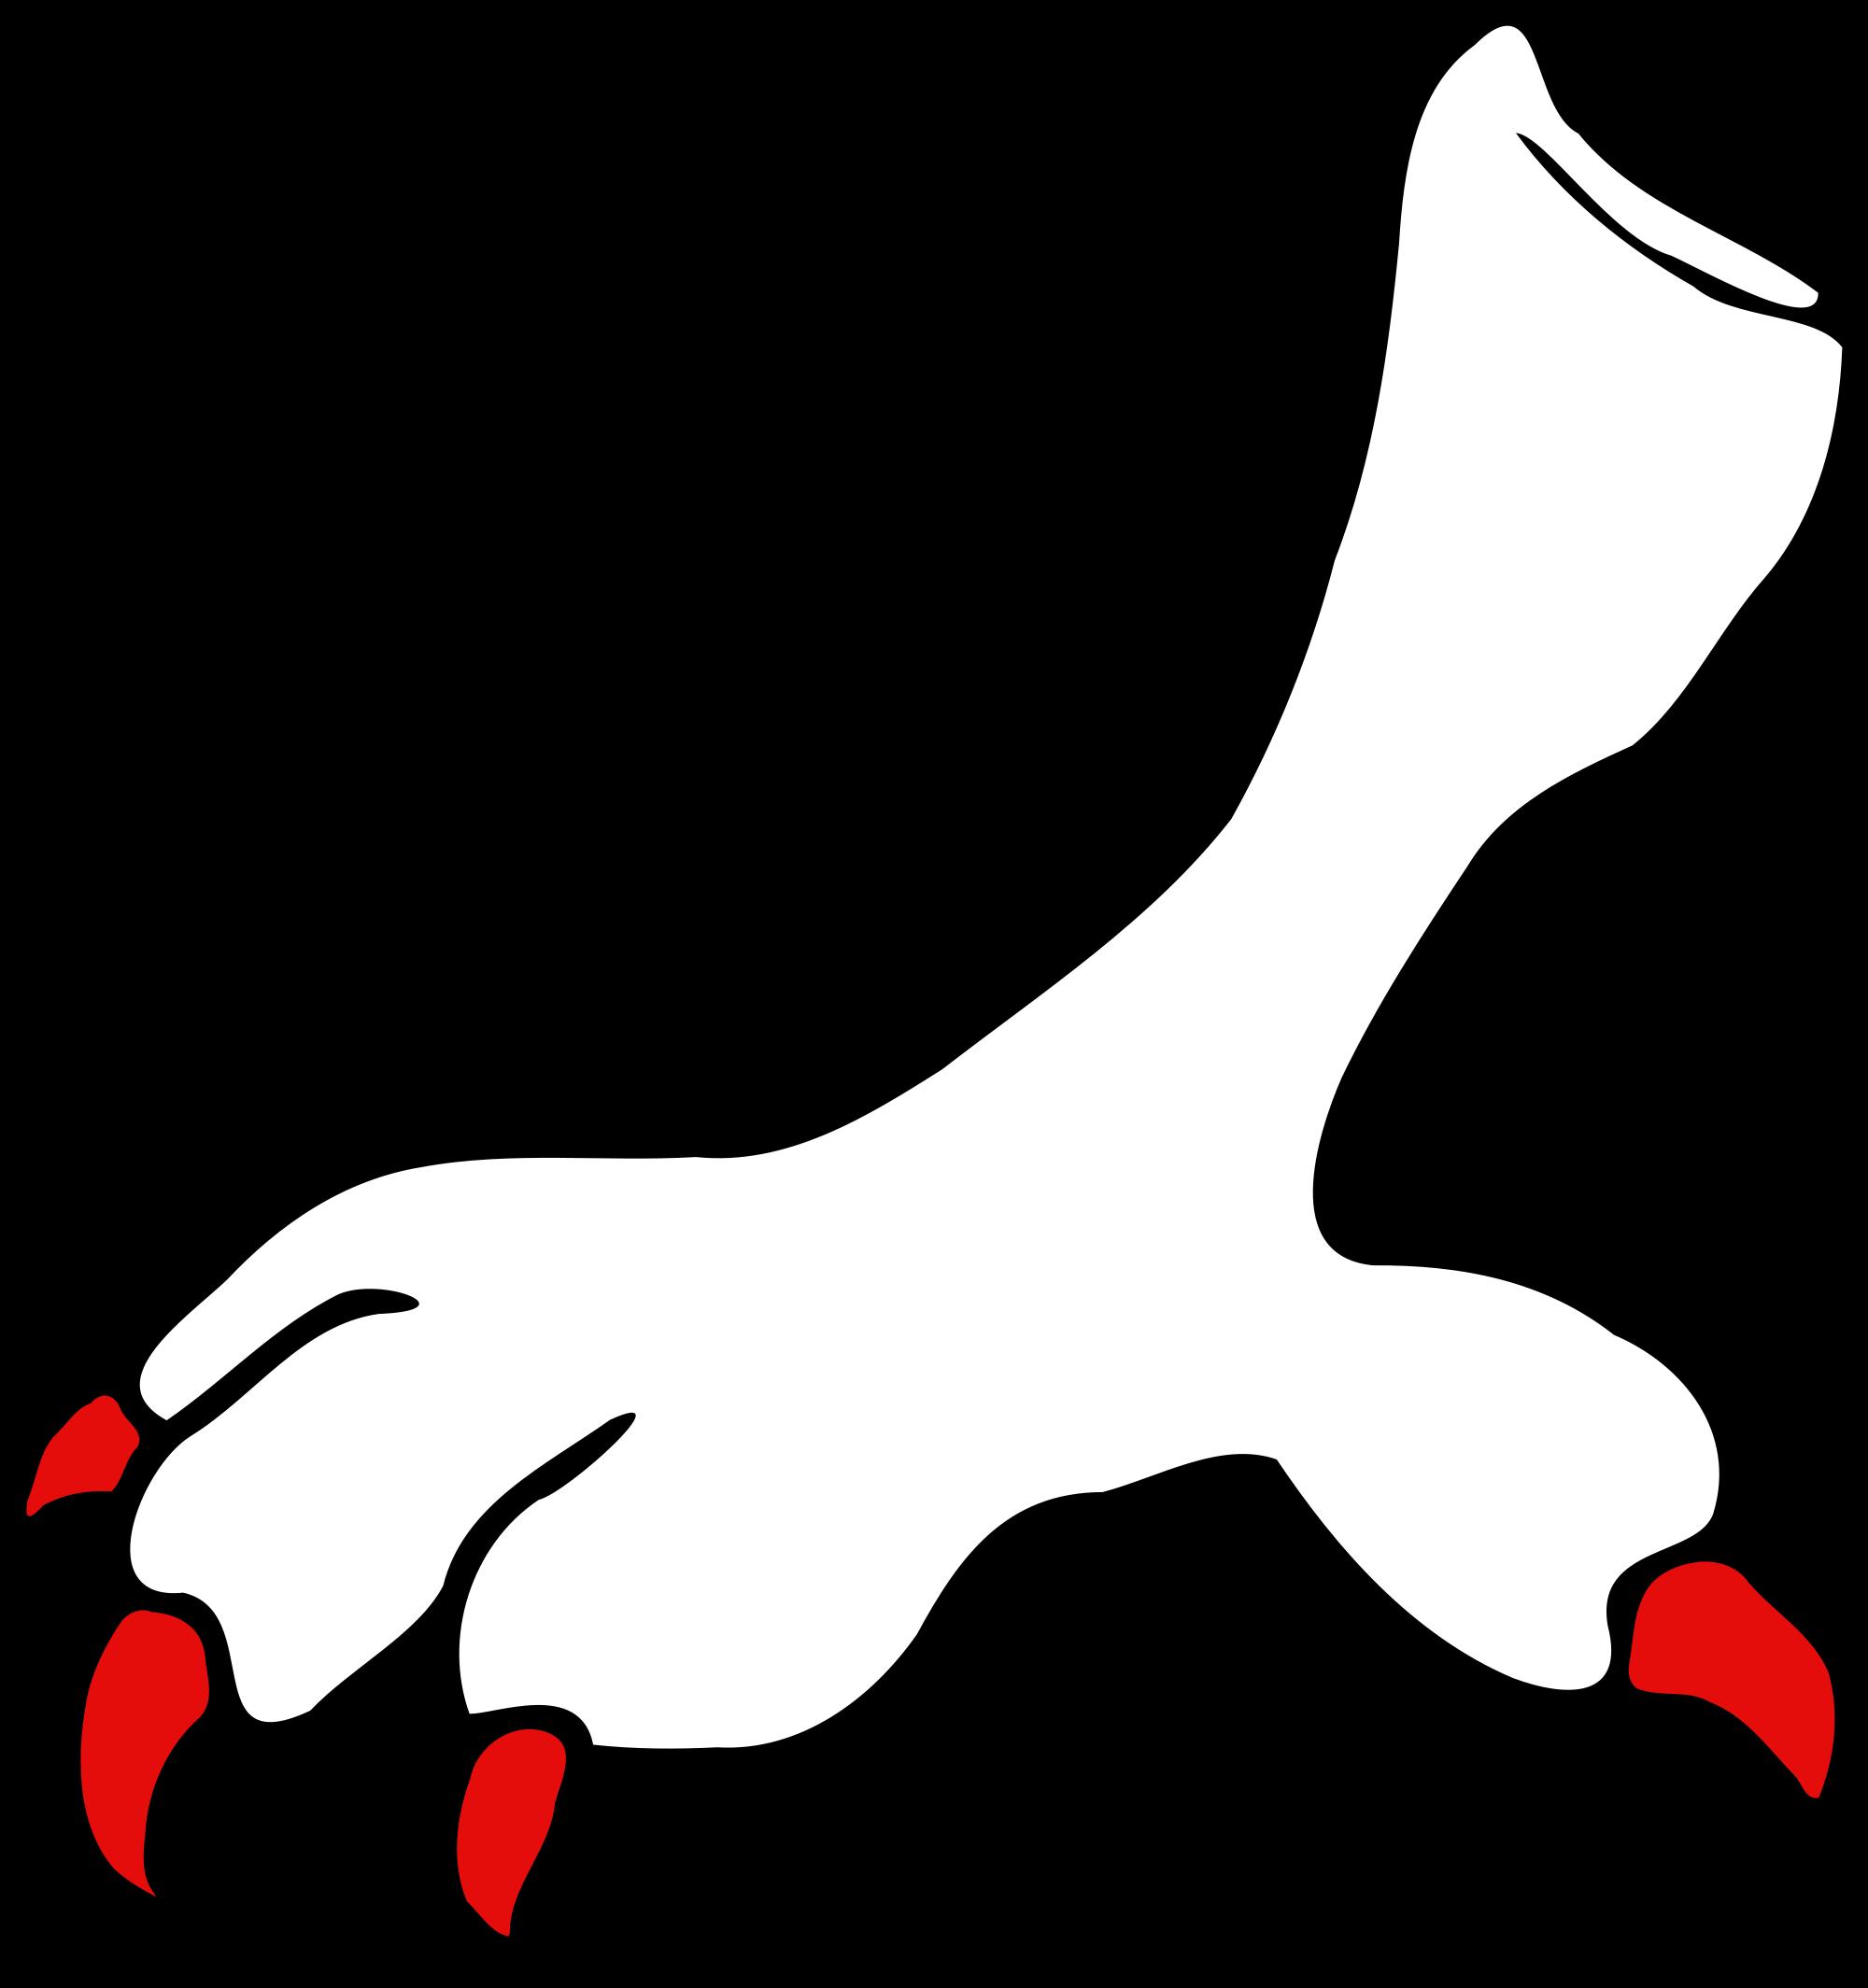 Feet clipart bird. File heraldique serre svg